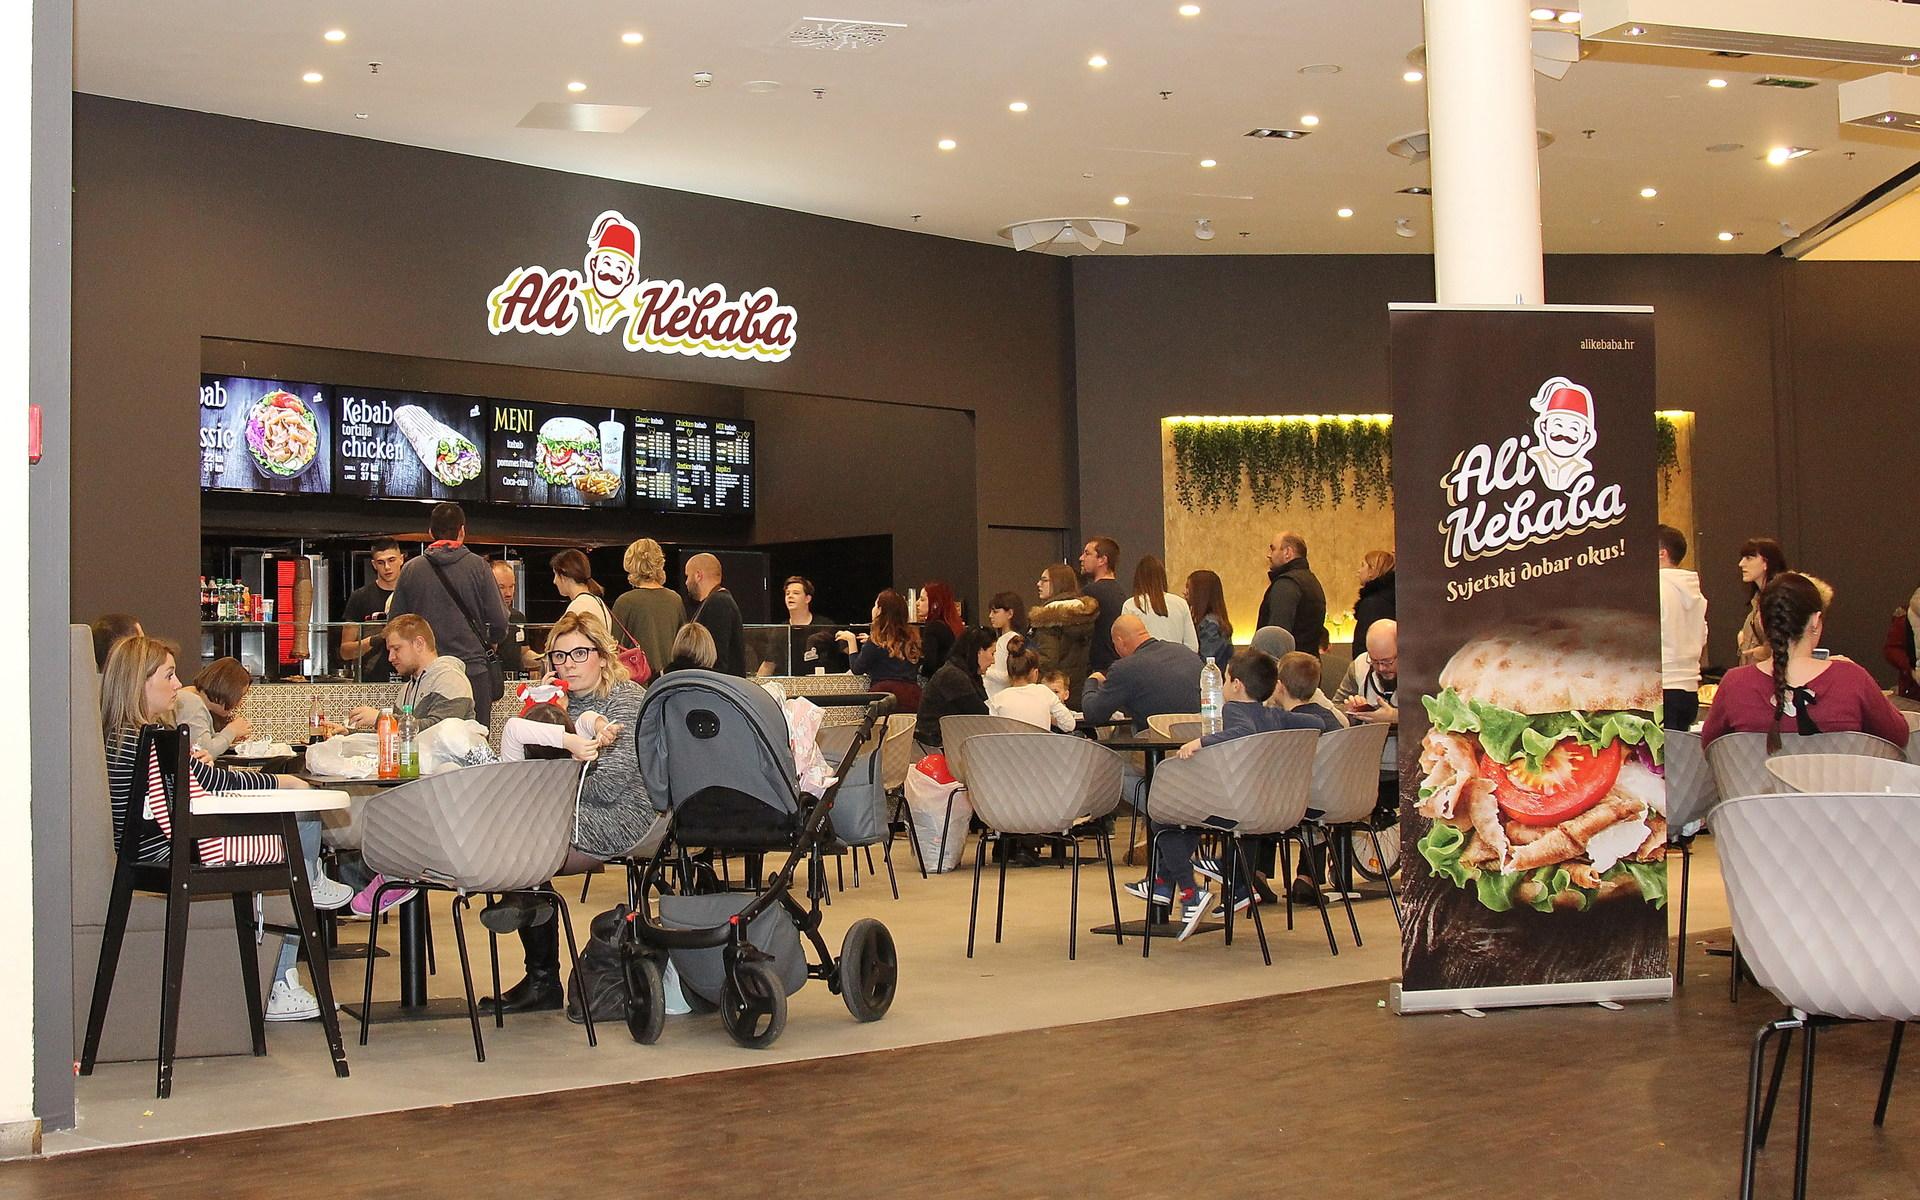 Miris kebaba širi se Westgateom, otvorio se Ali Kebaba!